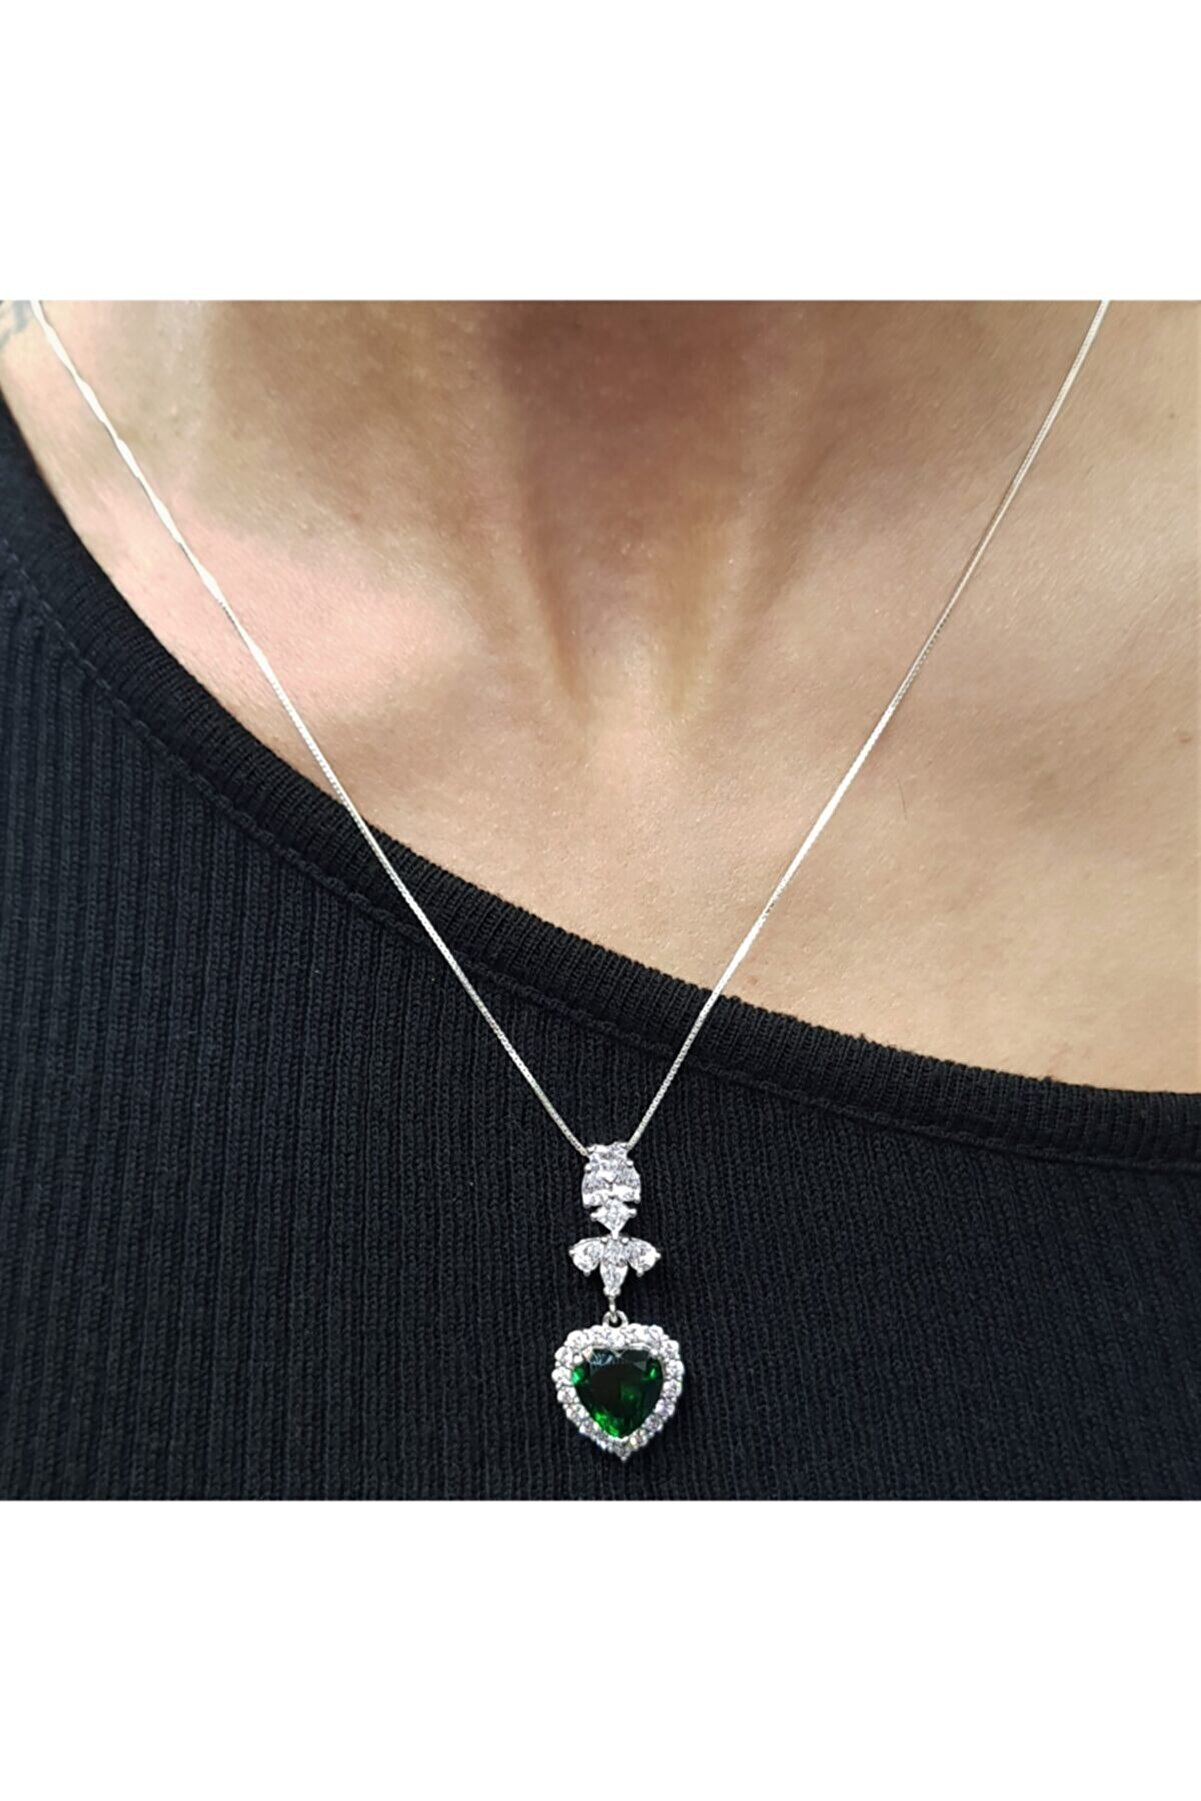 Koza Kadın 925 Ayar Gümüş Yeşil Zirkon Taşlı Kolye